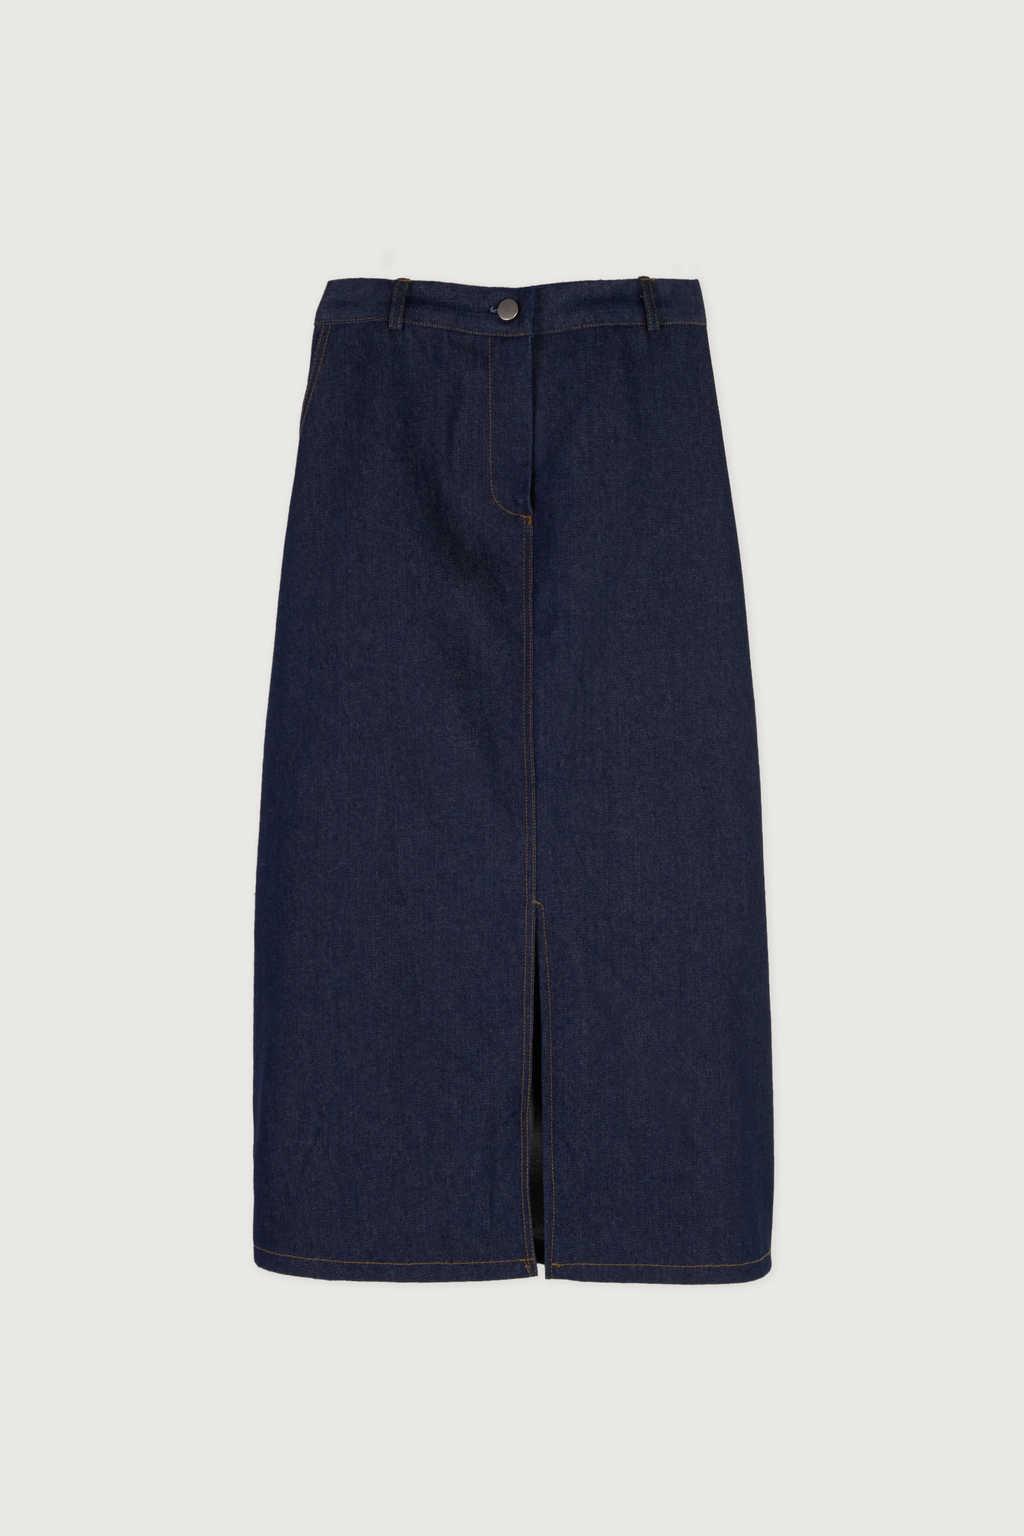 Skirt J010 Indigo 5